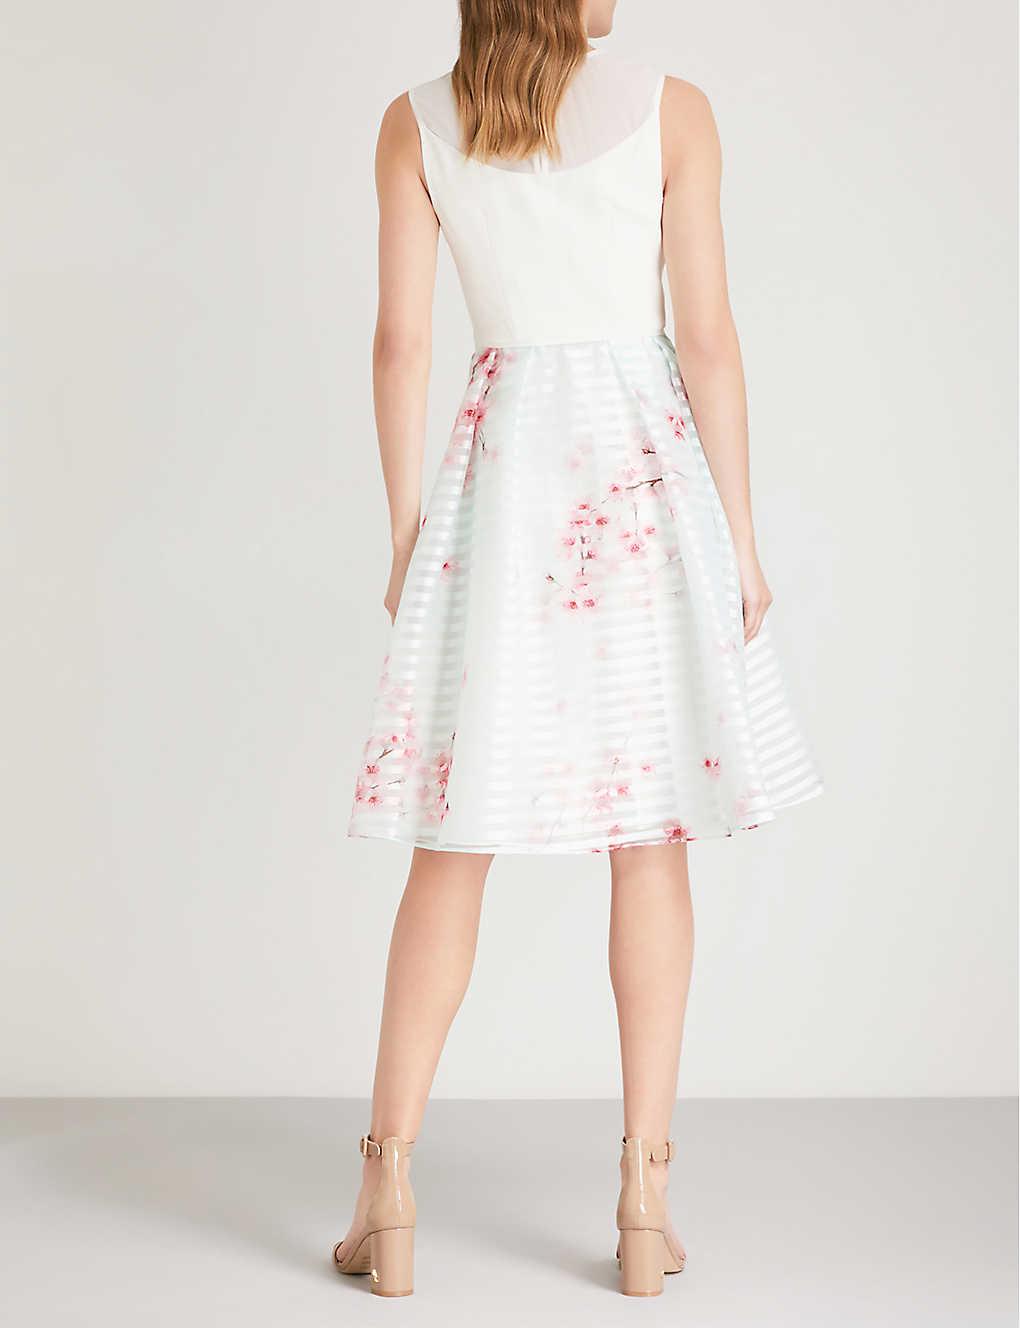 21605a46c TED BAKER - Idola Soft Blossom-print crepe and organza dress ...